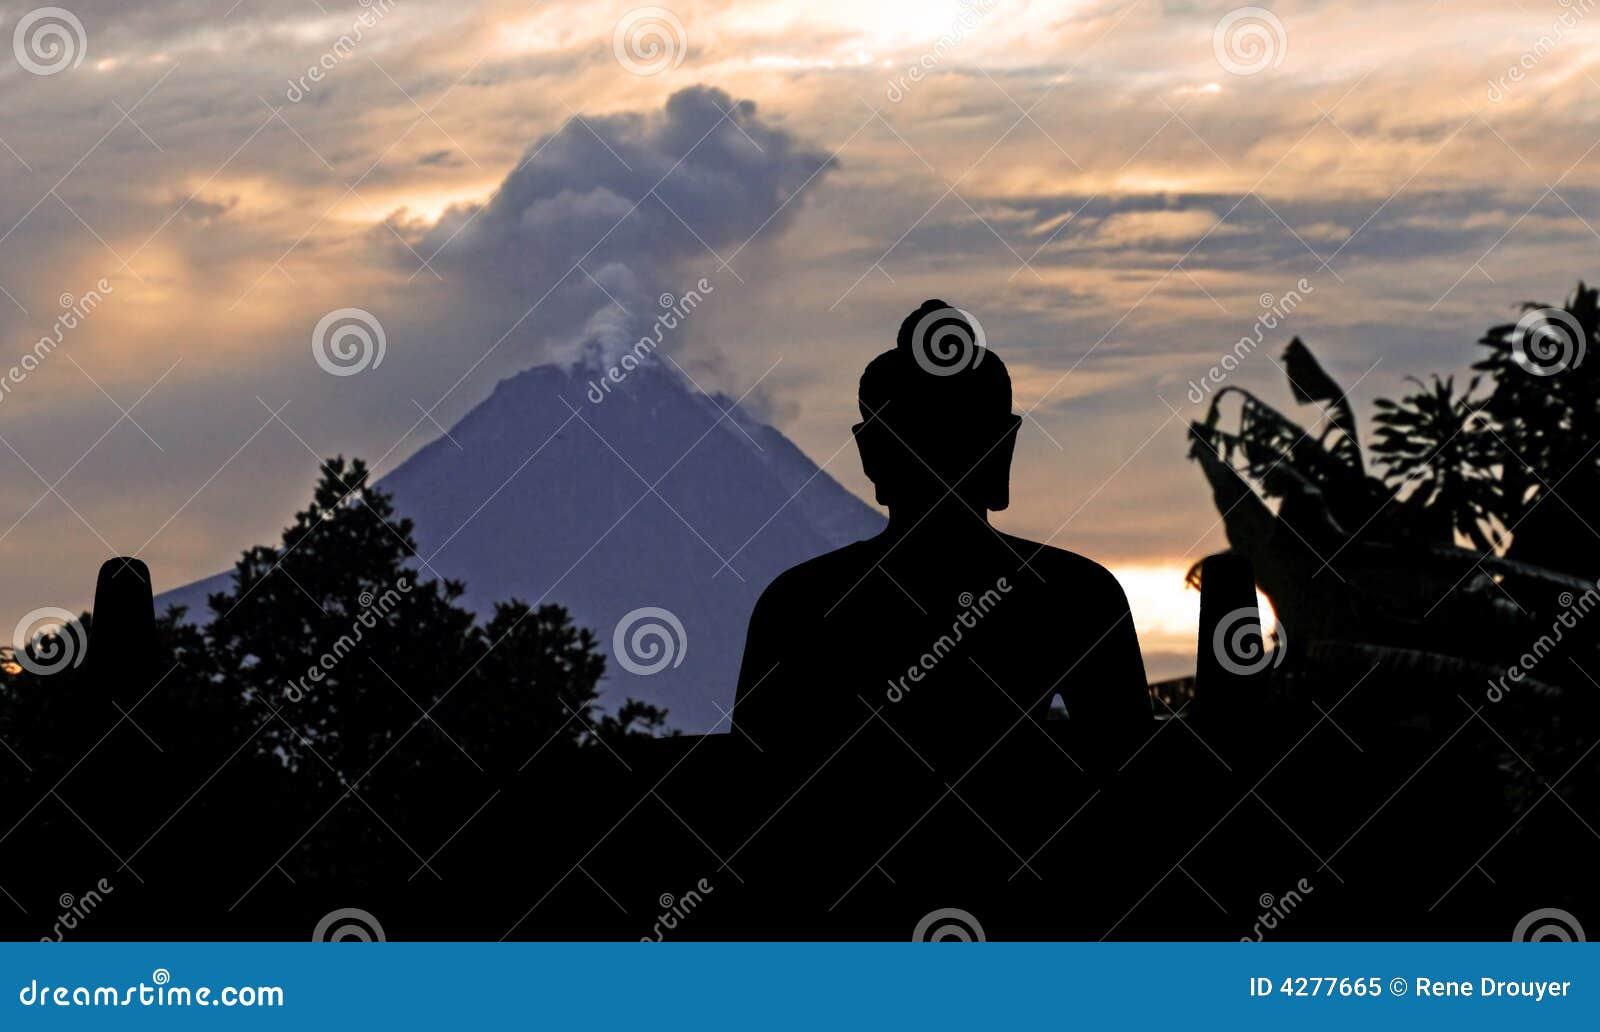 Indonesia, java, Borobudur: Merapi